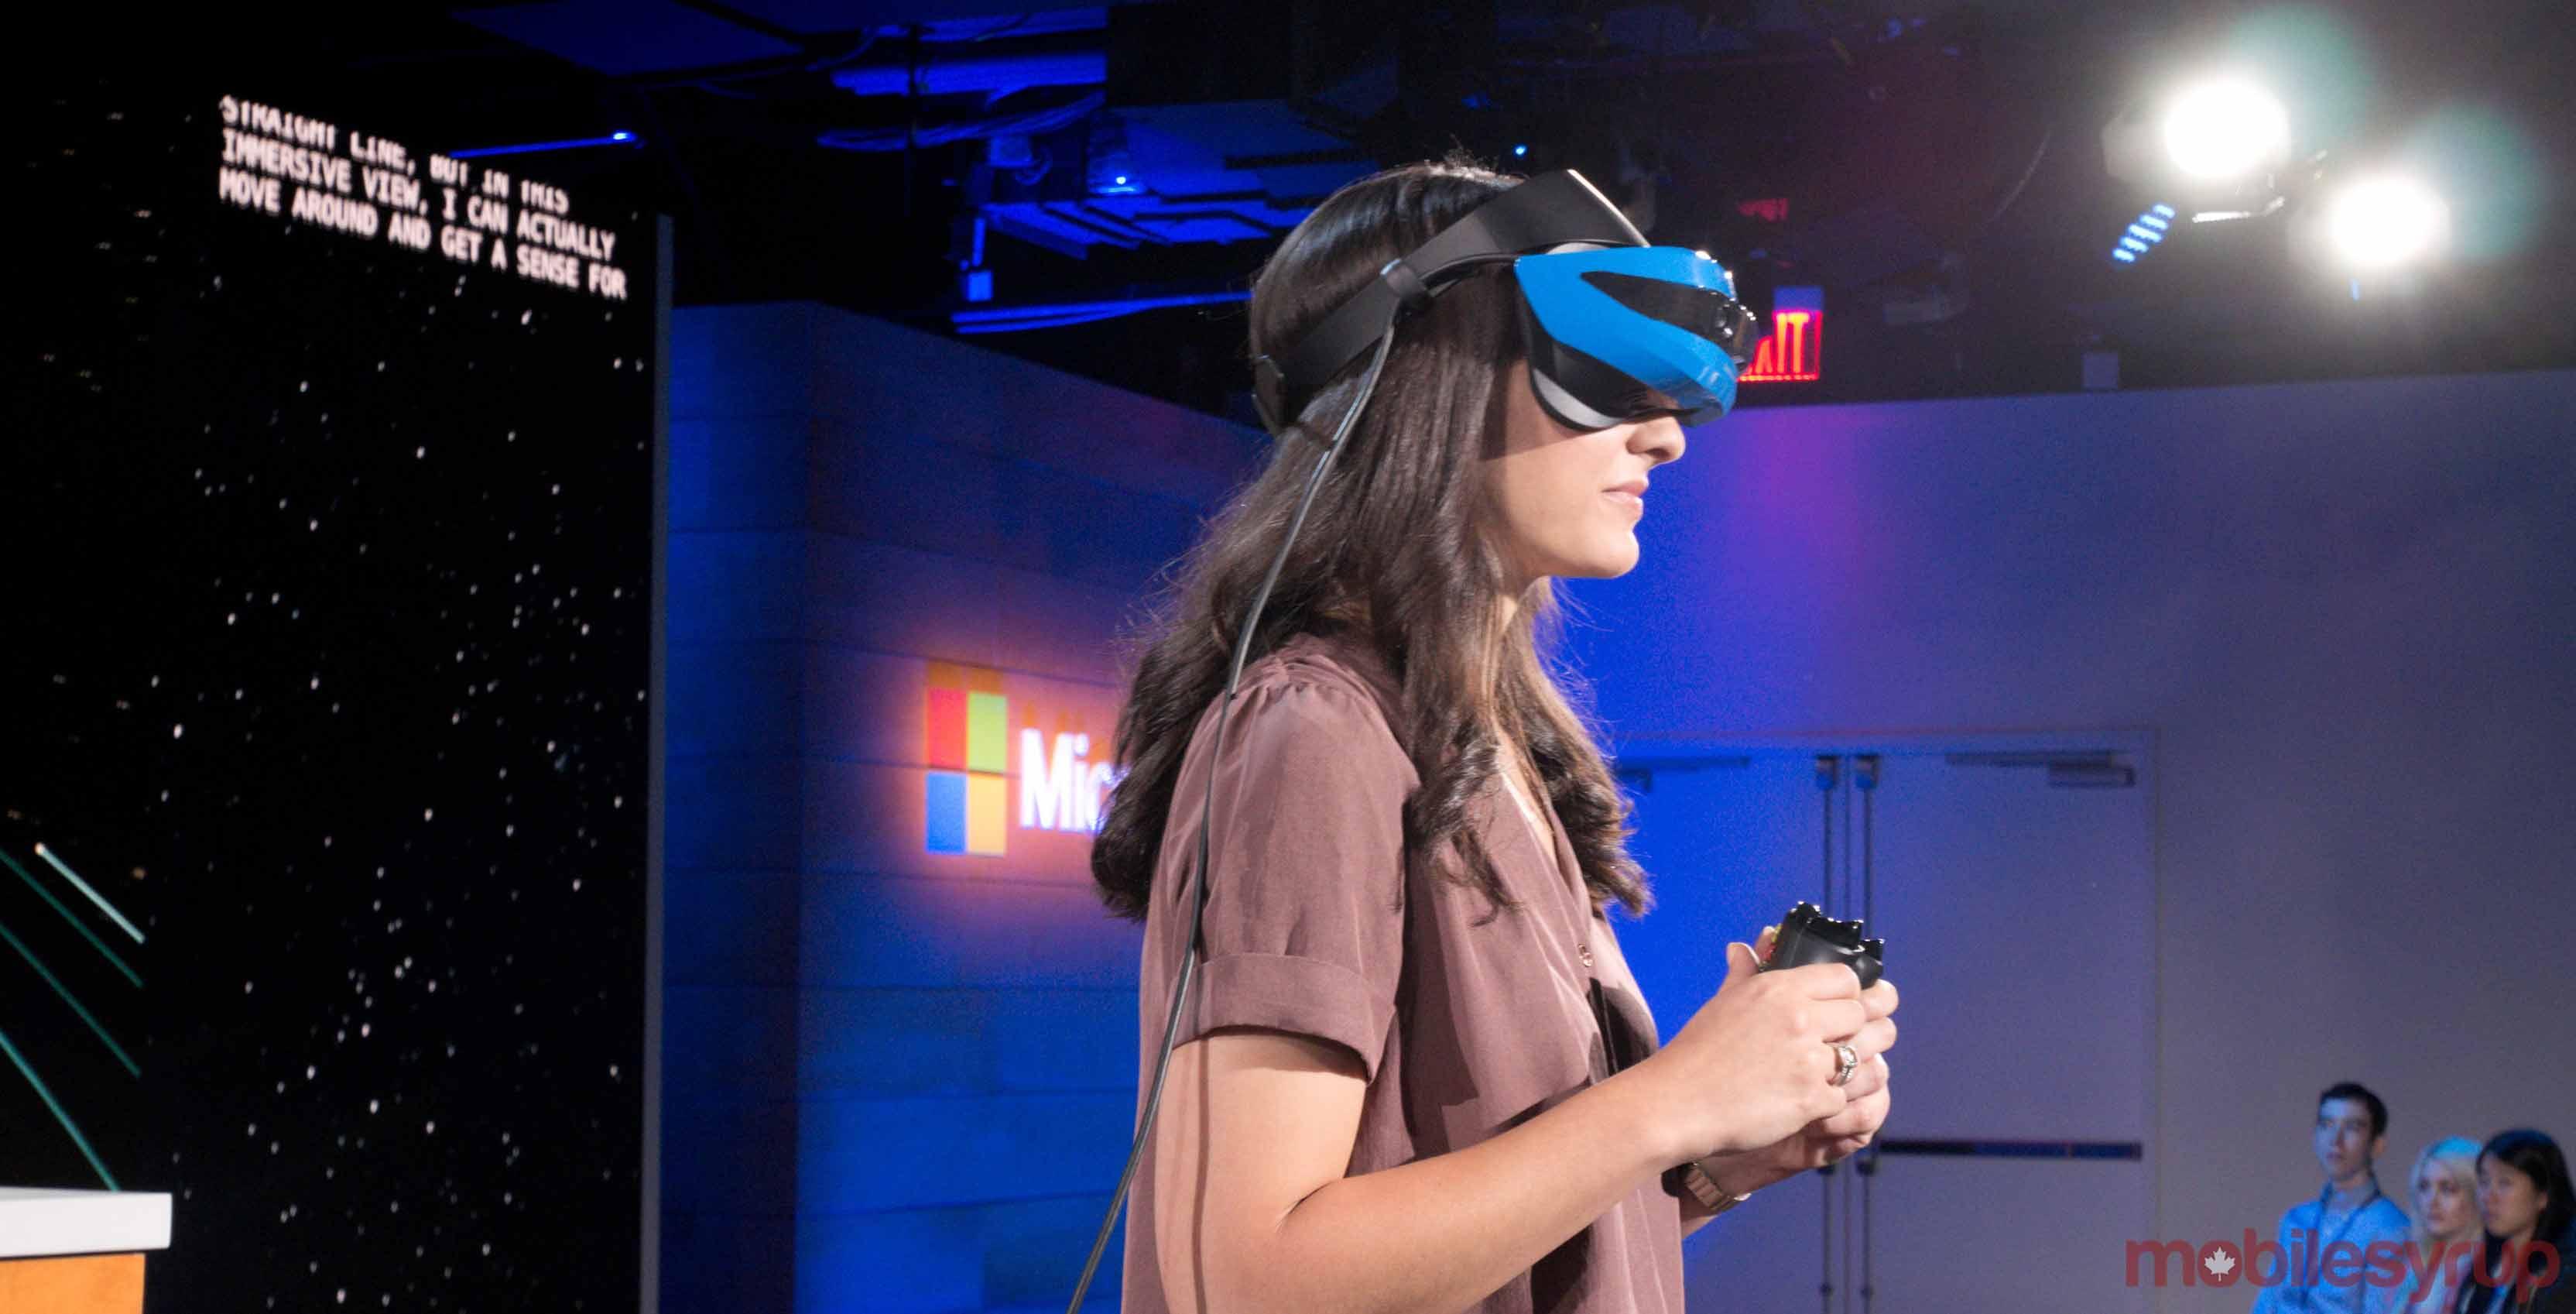 Microsoft augmented reality headset